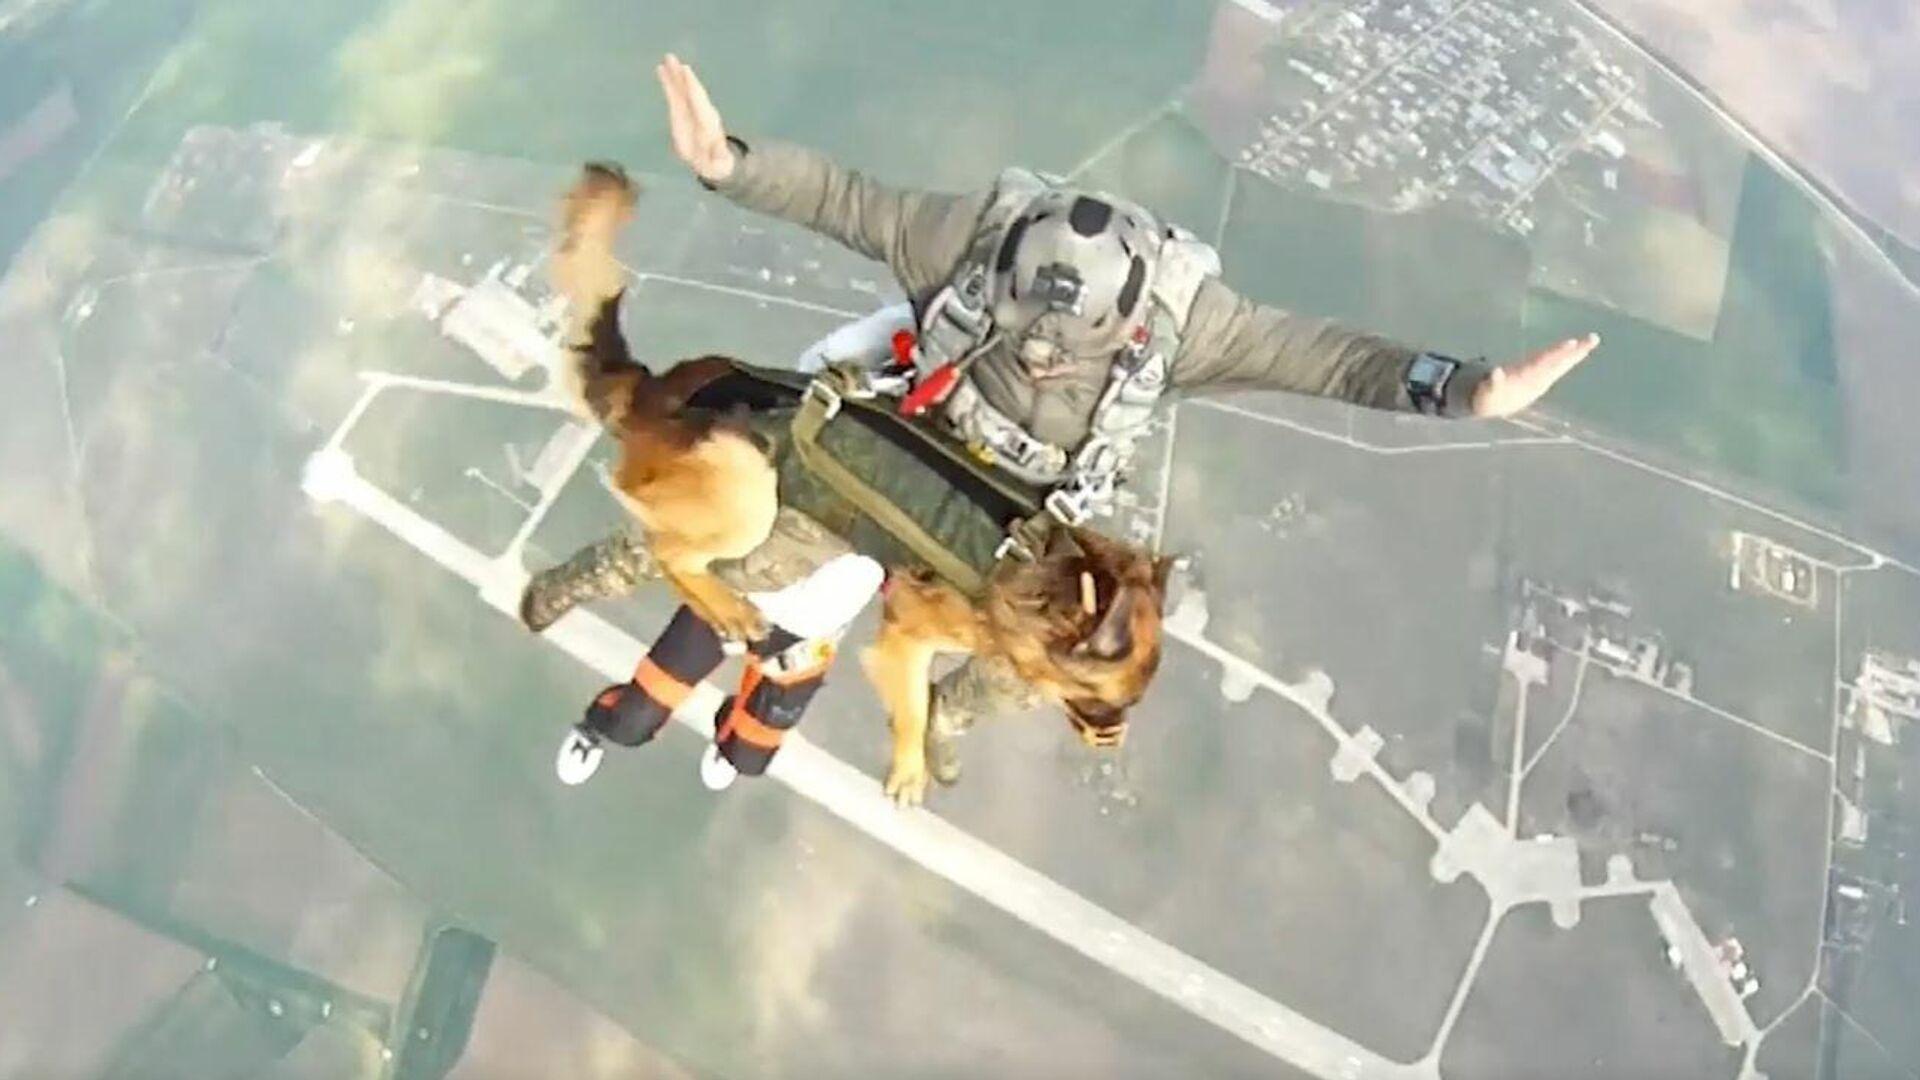 Prueban un sistema de paracaidismo canino en Rusia - Sputnik Mundo, 1920, 08.07.2021